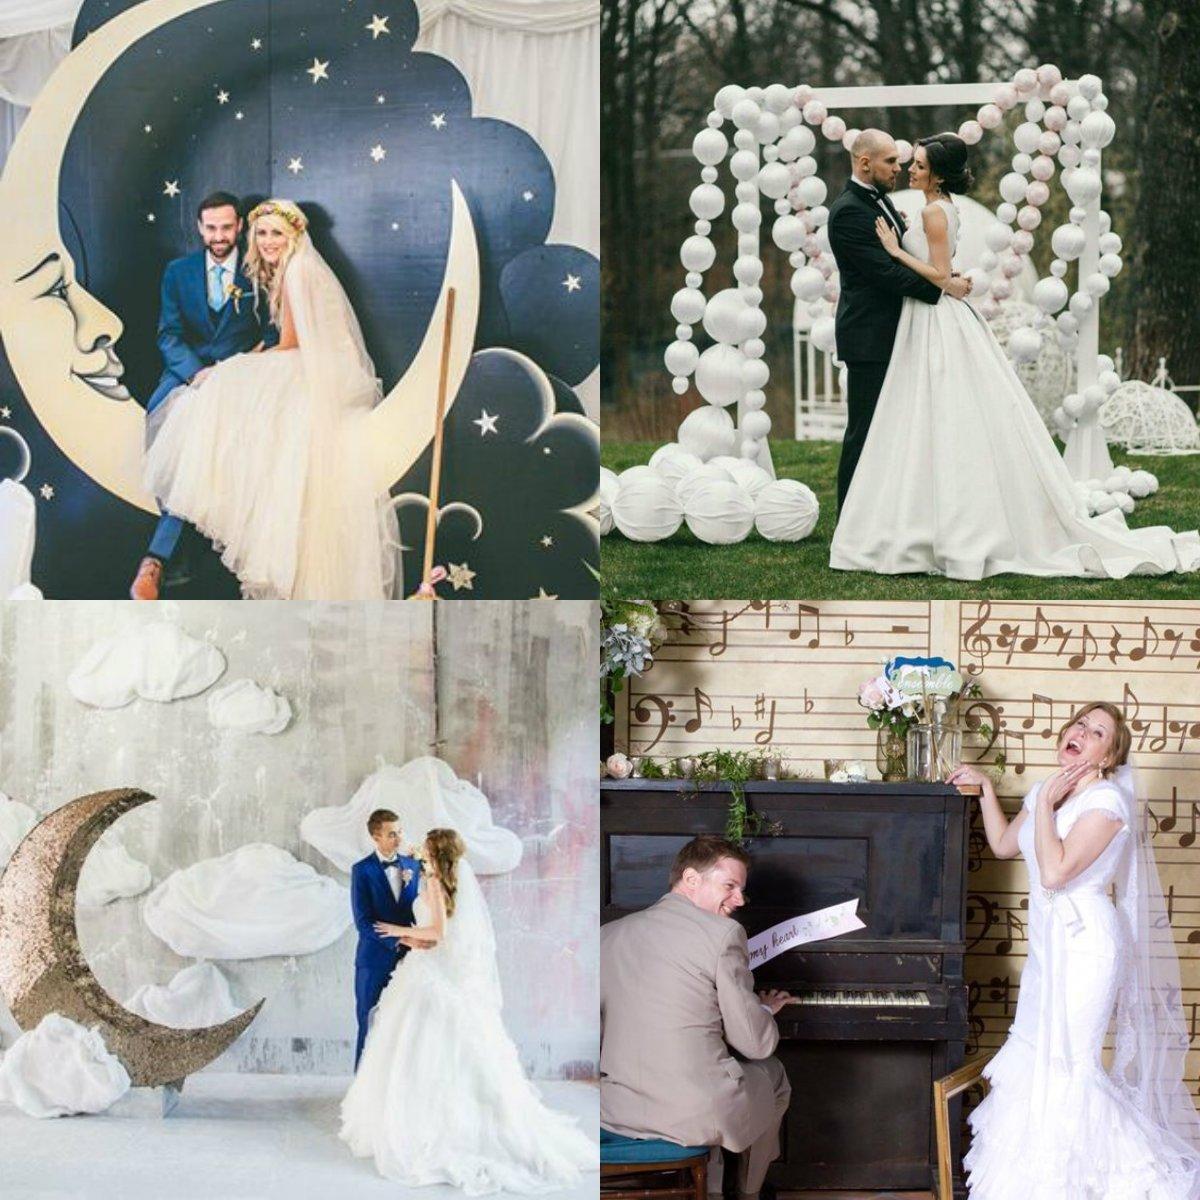 10 Perfect Photo Booth Ideas For Wedding wedding photobooth kit ideas to make fun weddceremony 2021